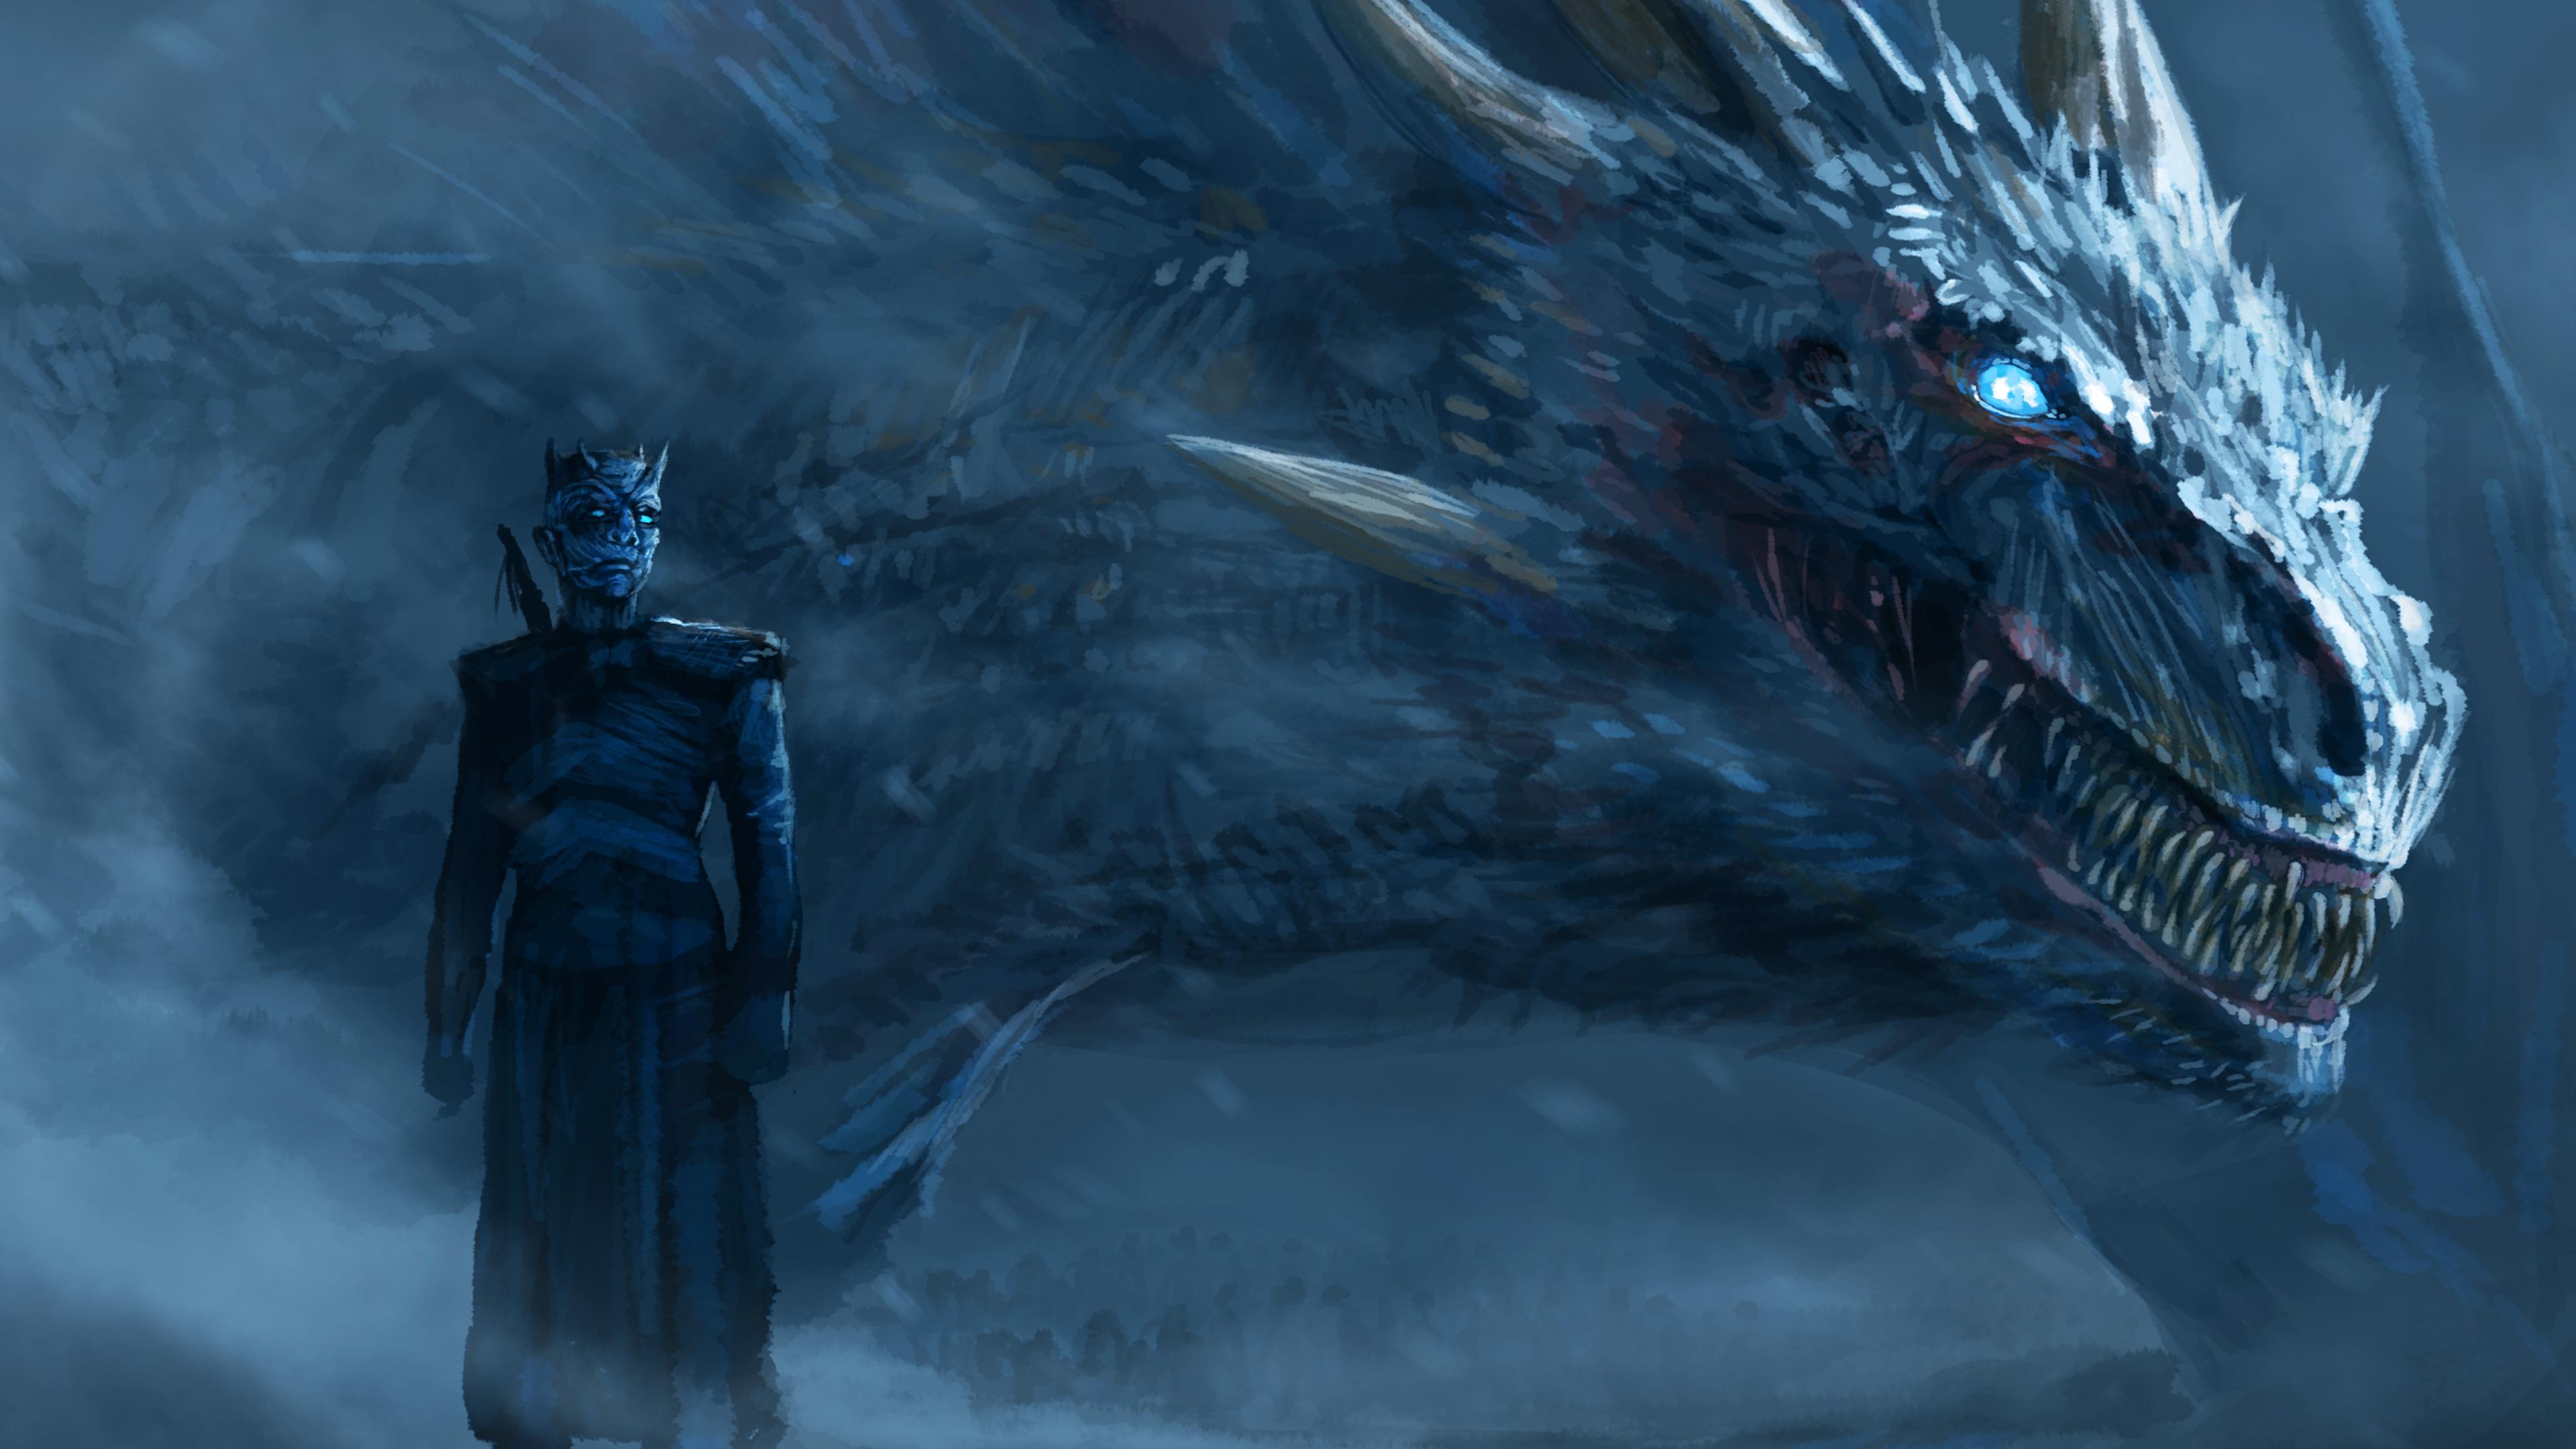 2048x1152, Night King Blue Eyes White Dragon 6b   Data - Game Of Thrones Wallpaper 4k - HD Wallpaper